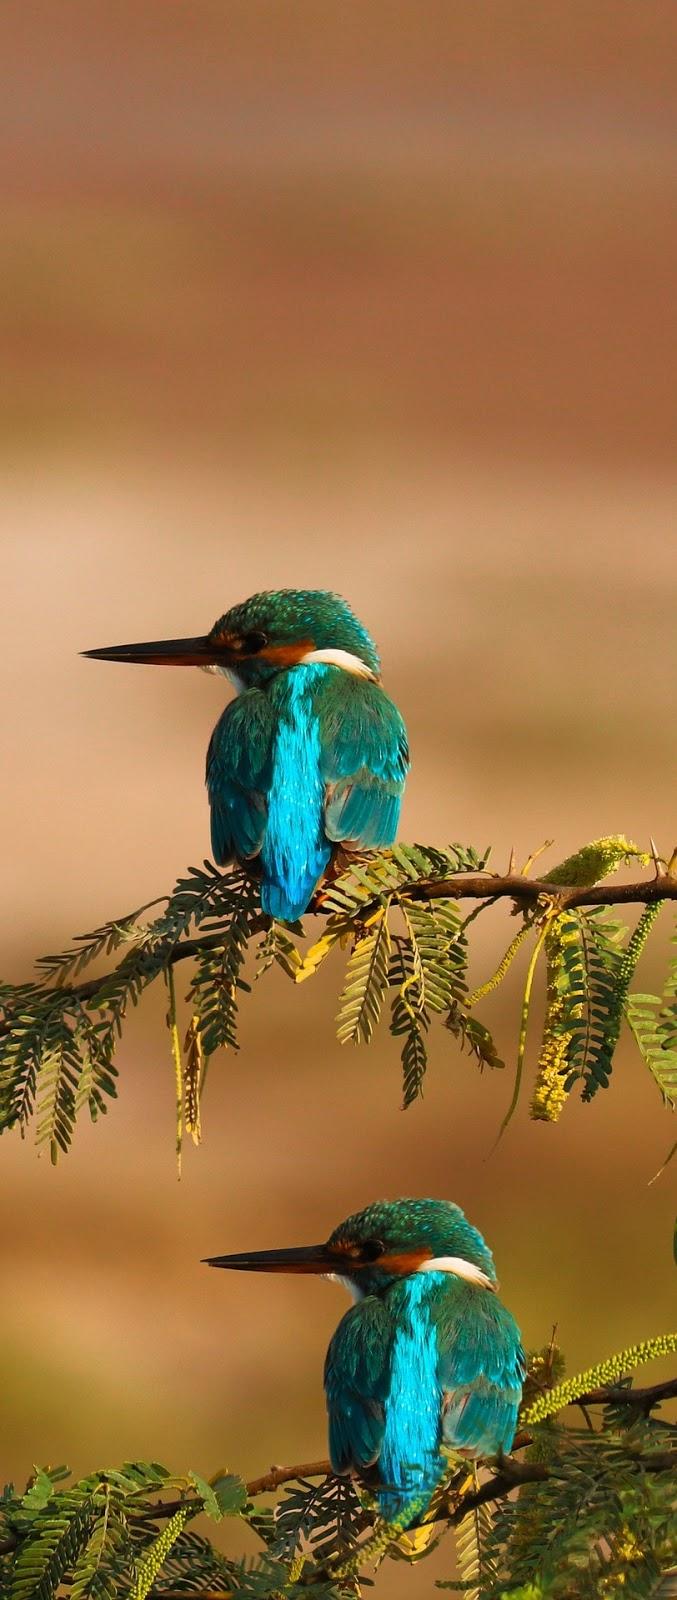 Pair of beautiful kingfisher birds.